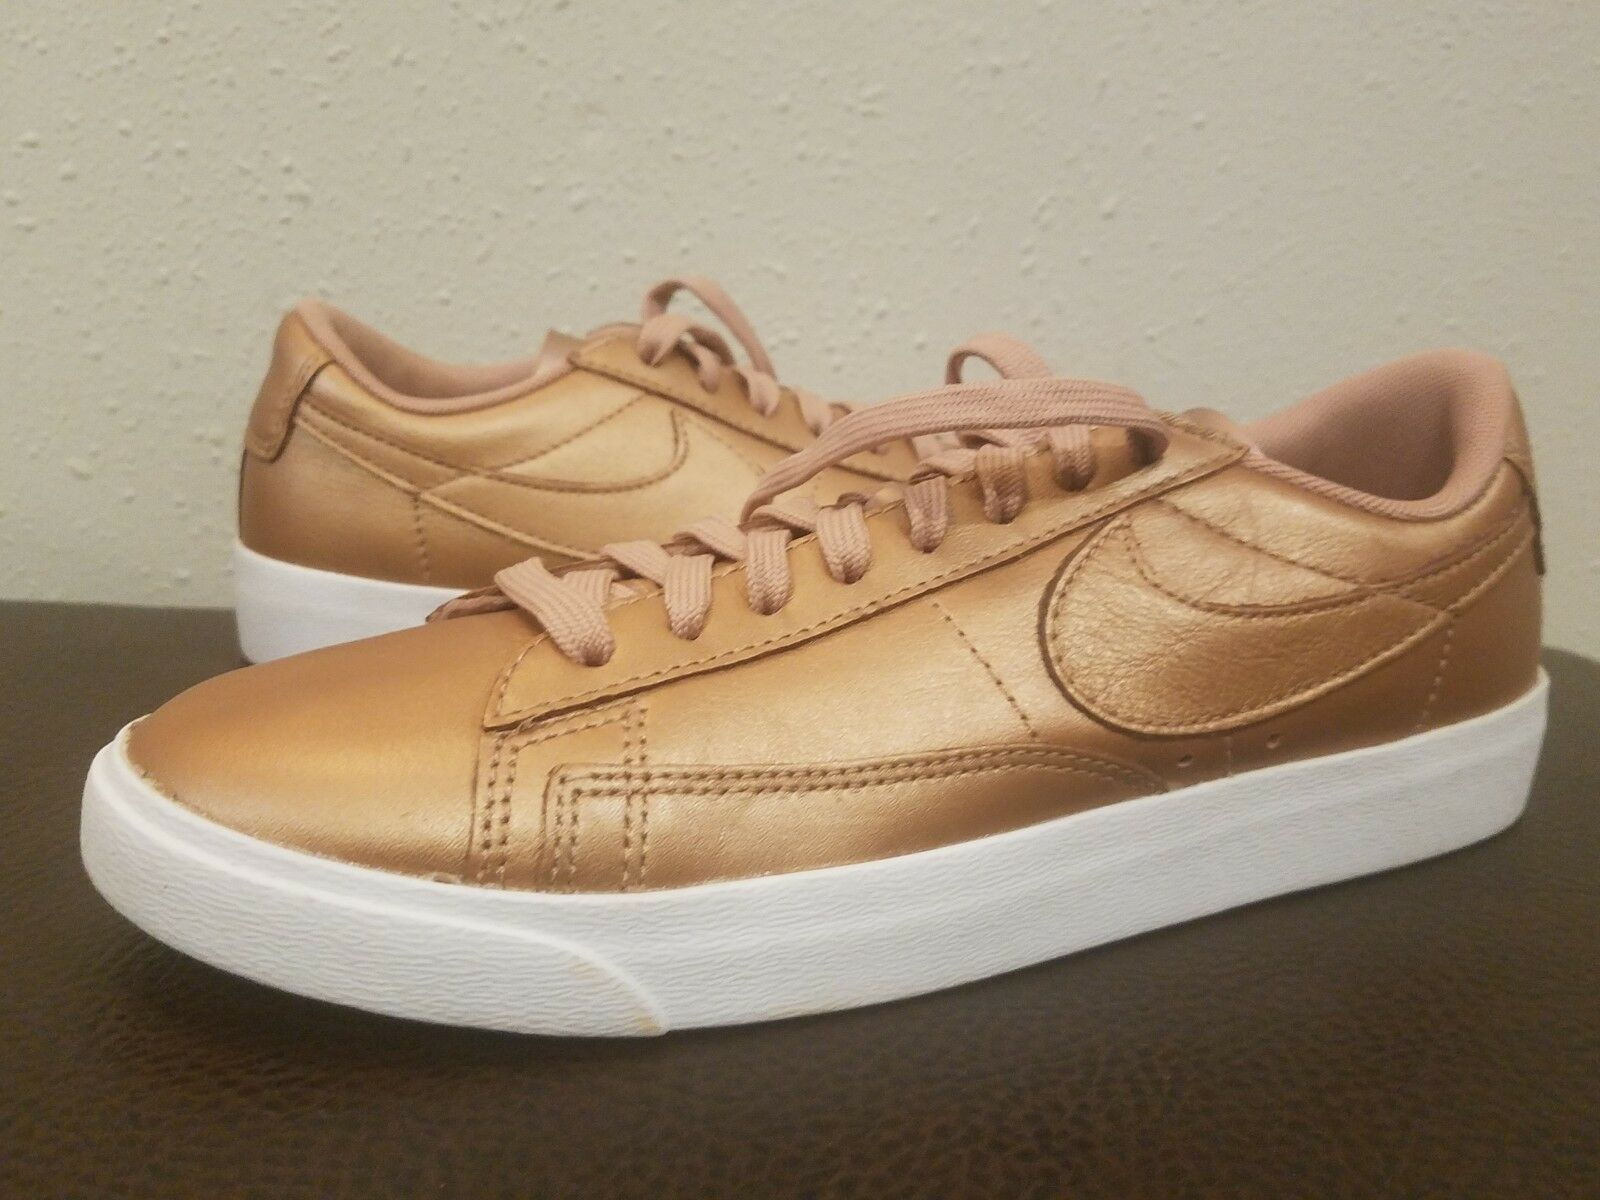 Nike Blazer Baja le Rojo Metálico Bronce AA3961 903 903 903 para mujeres Zapatos 7.5  marca famosa